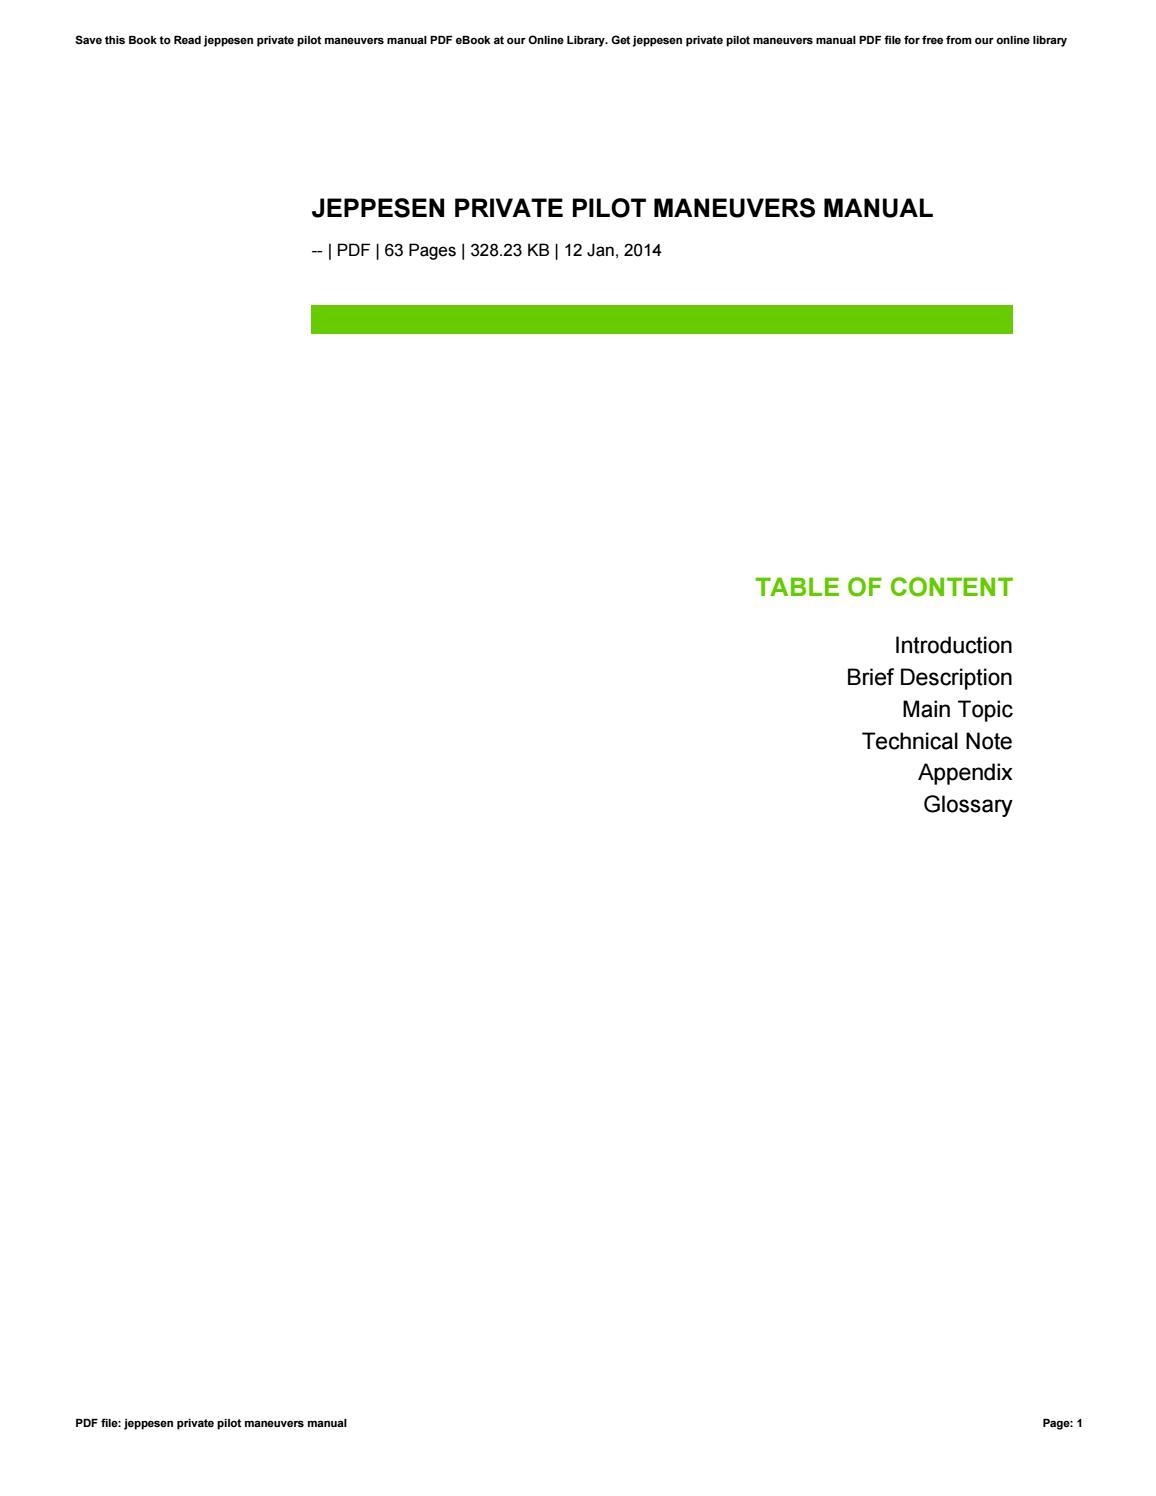 jeppesen private pilot maneuvers manual by sroff15 issuu rh issuu com